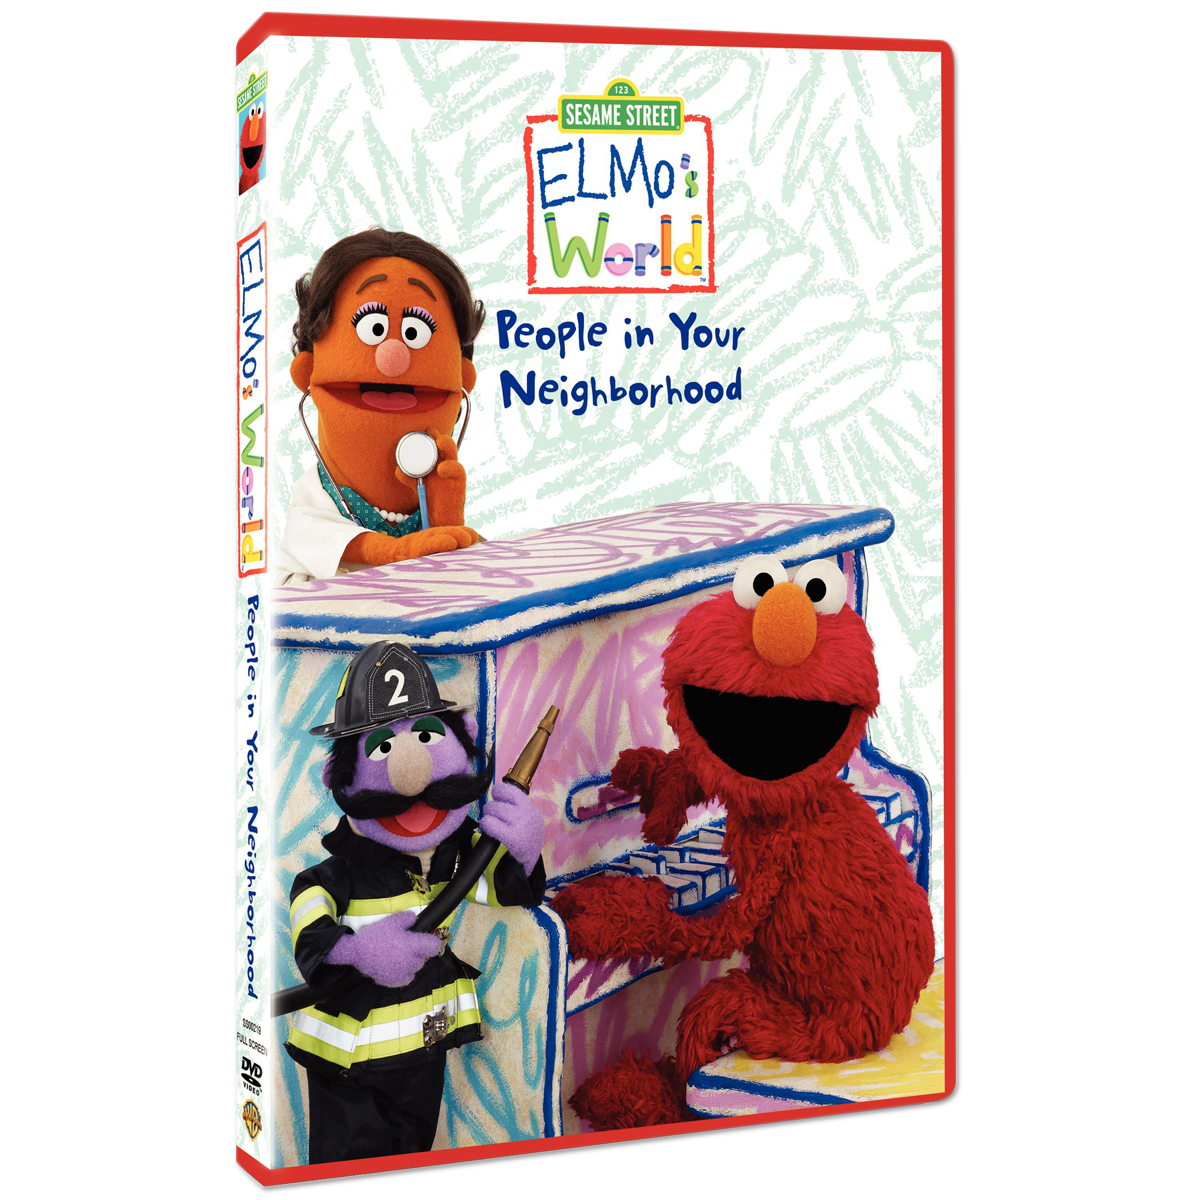 Elmo's World: People in Your Neighborhood DVD